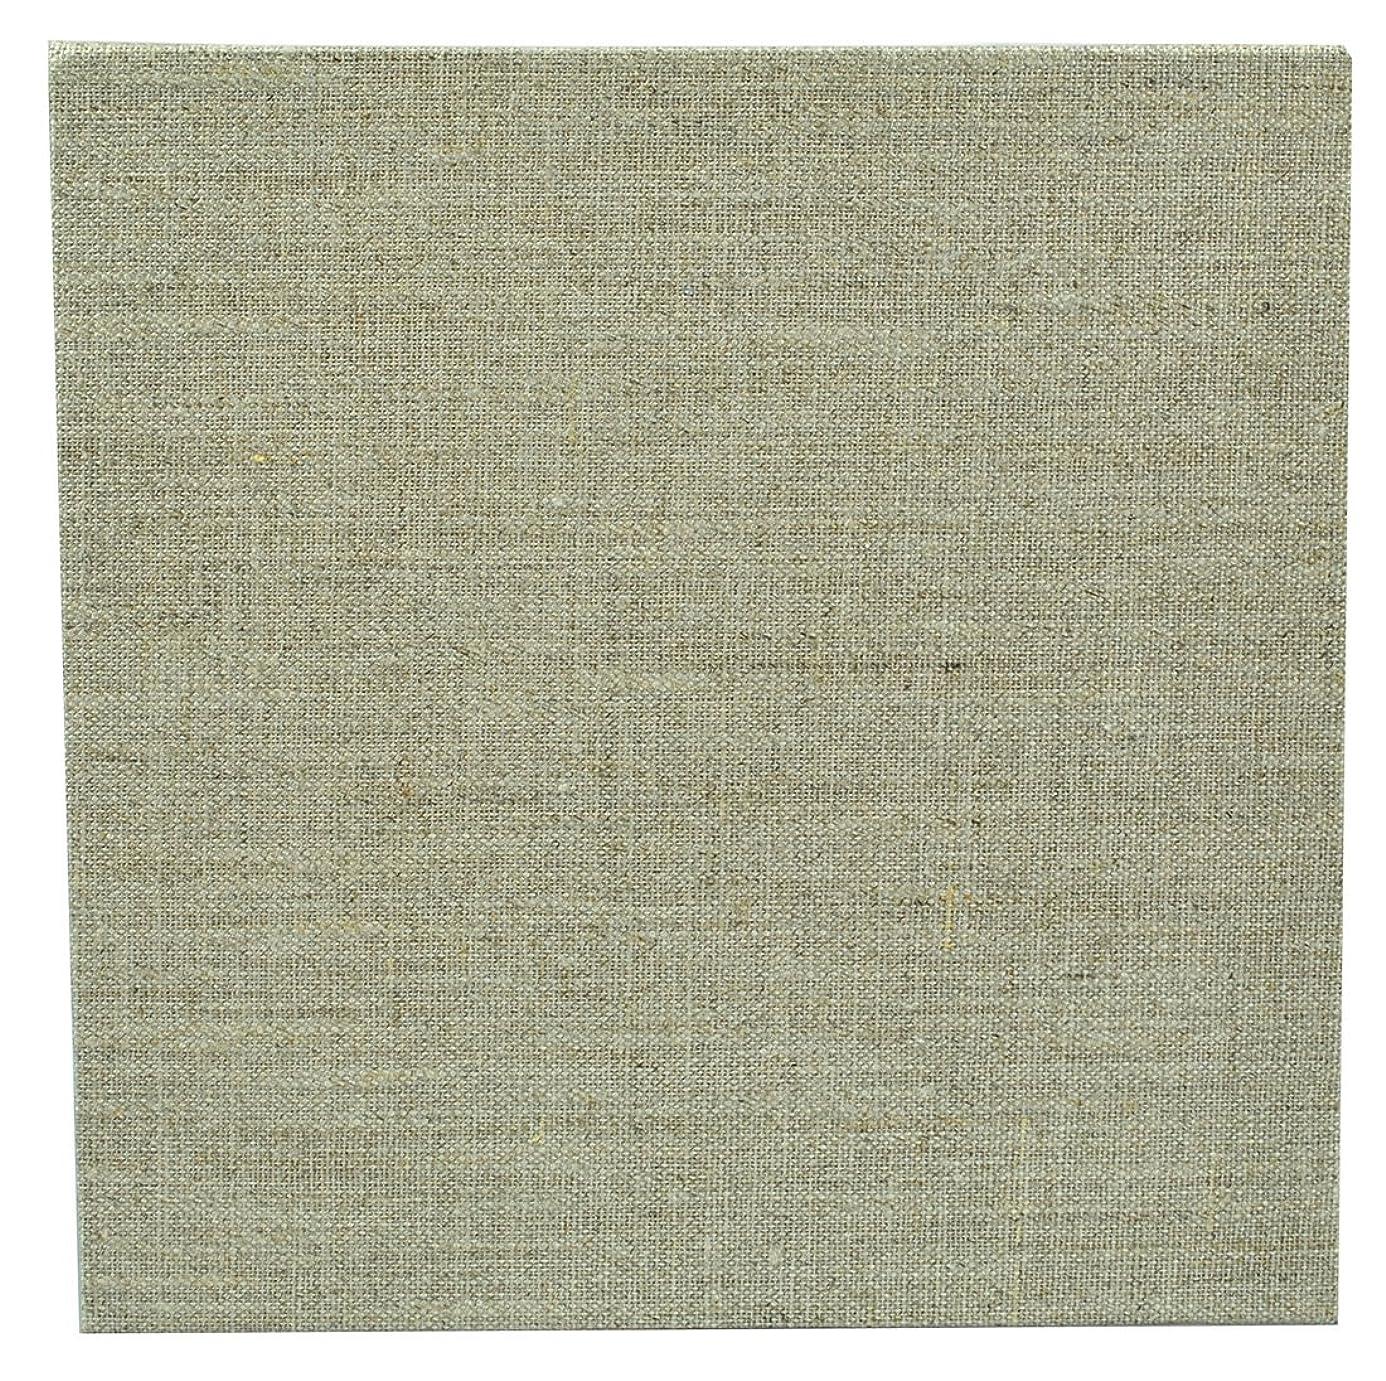 Pebeo 20 x 20 cm Natural Linen Canvas Boards ema5732545